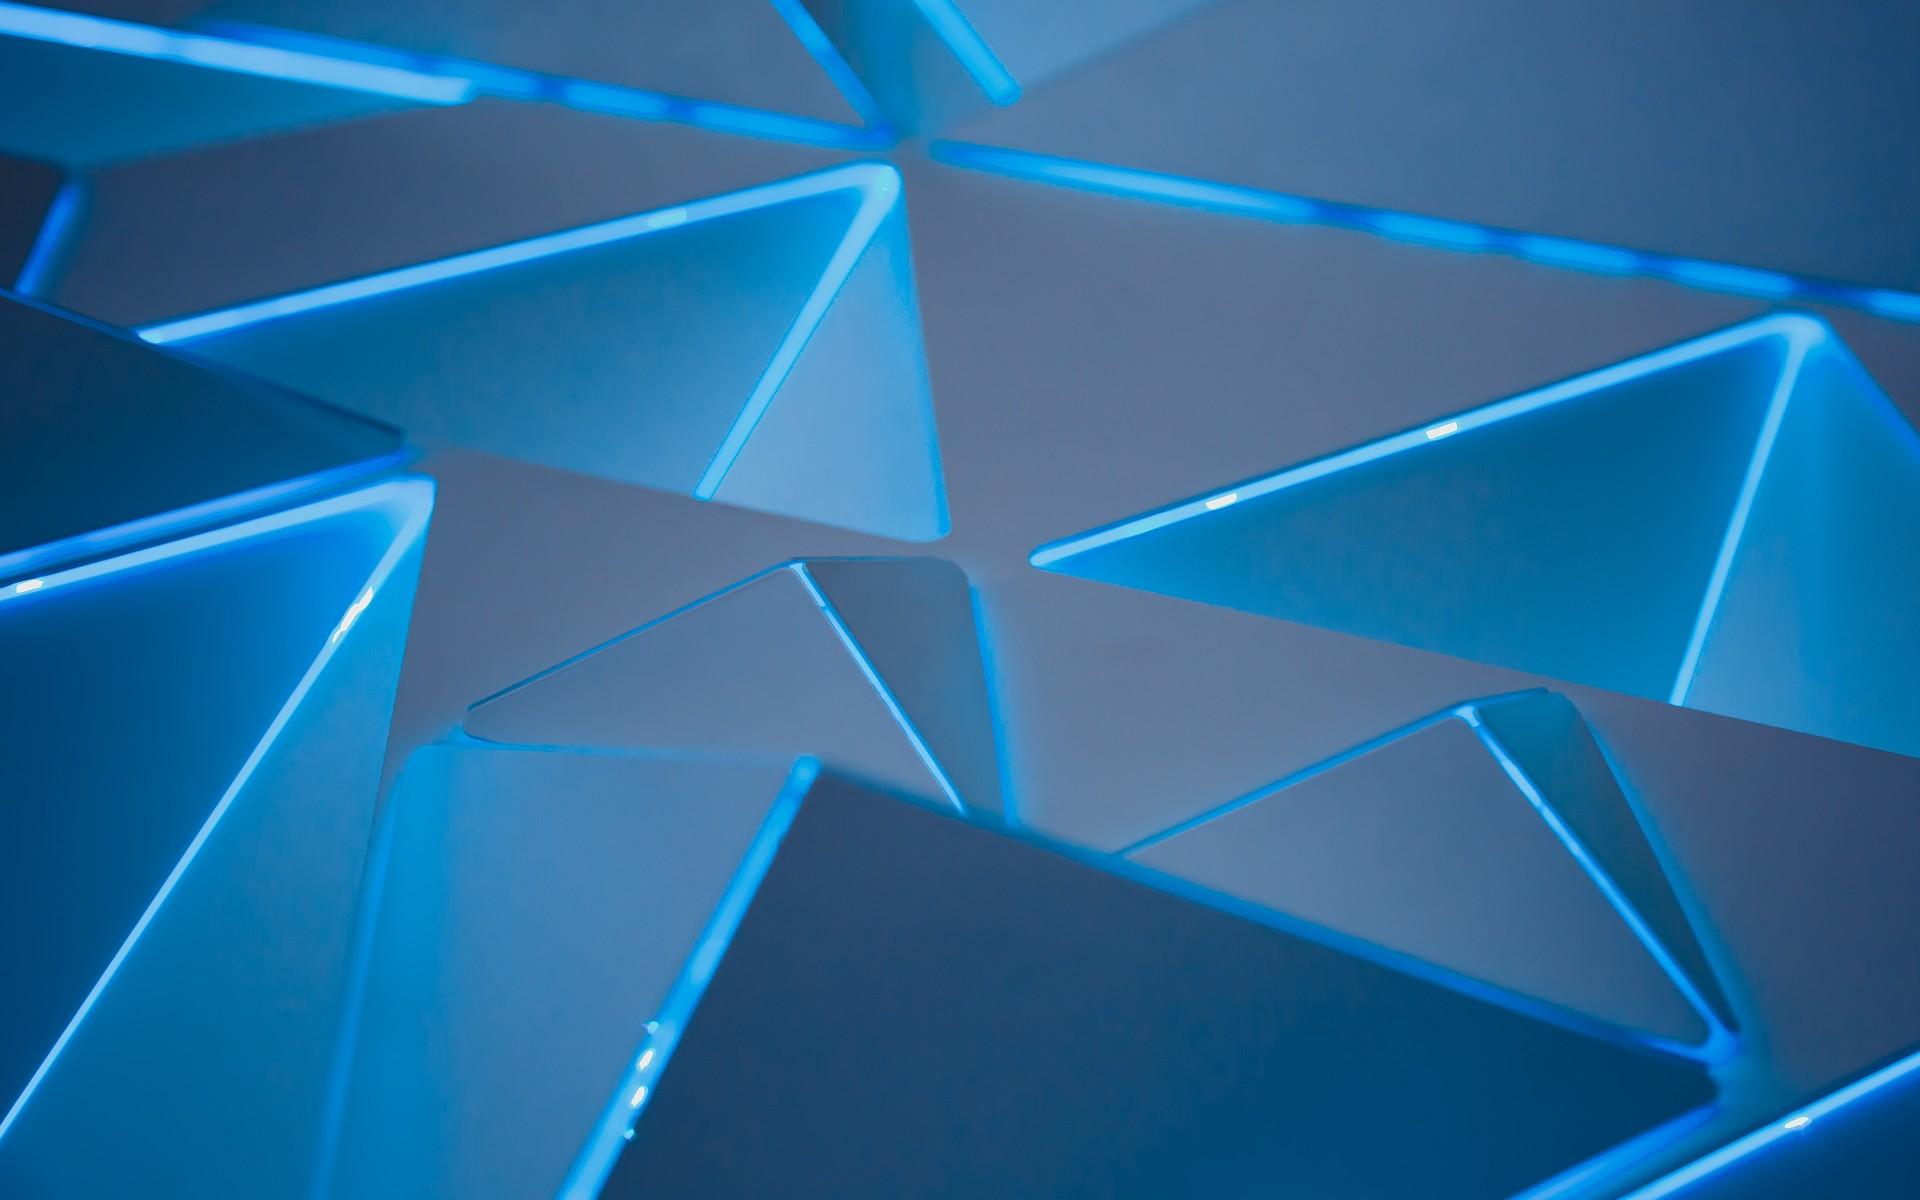 Pc Wallpaper Full Hd 3d 3d Blue Triangles Wallpapers Hd Wallpapers Id 24665